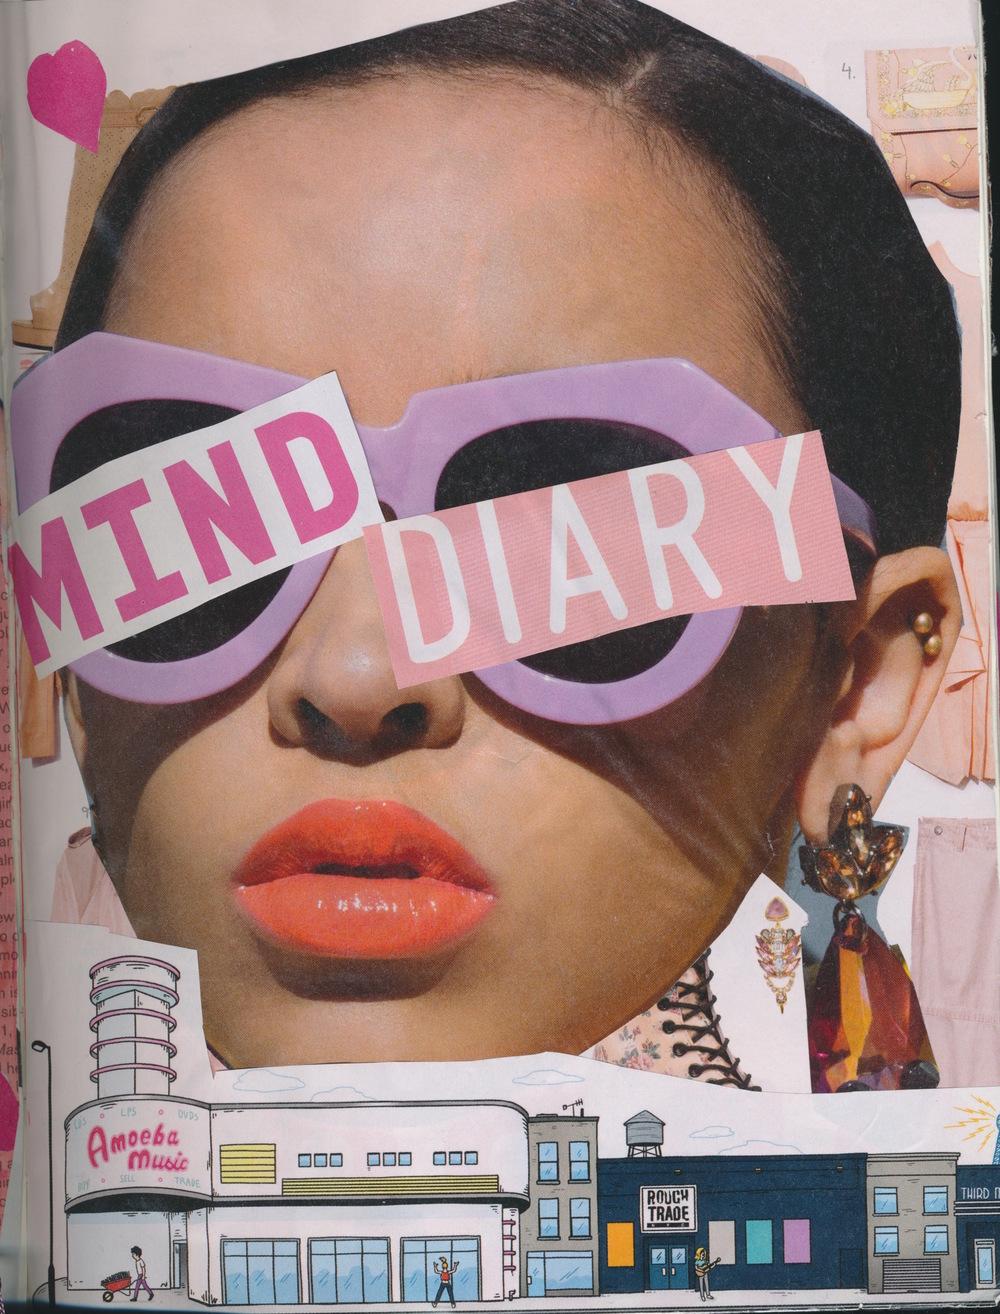 Mind Diary.jpg